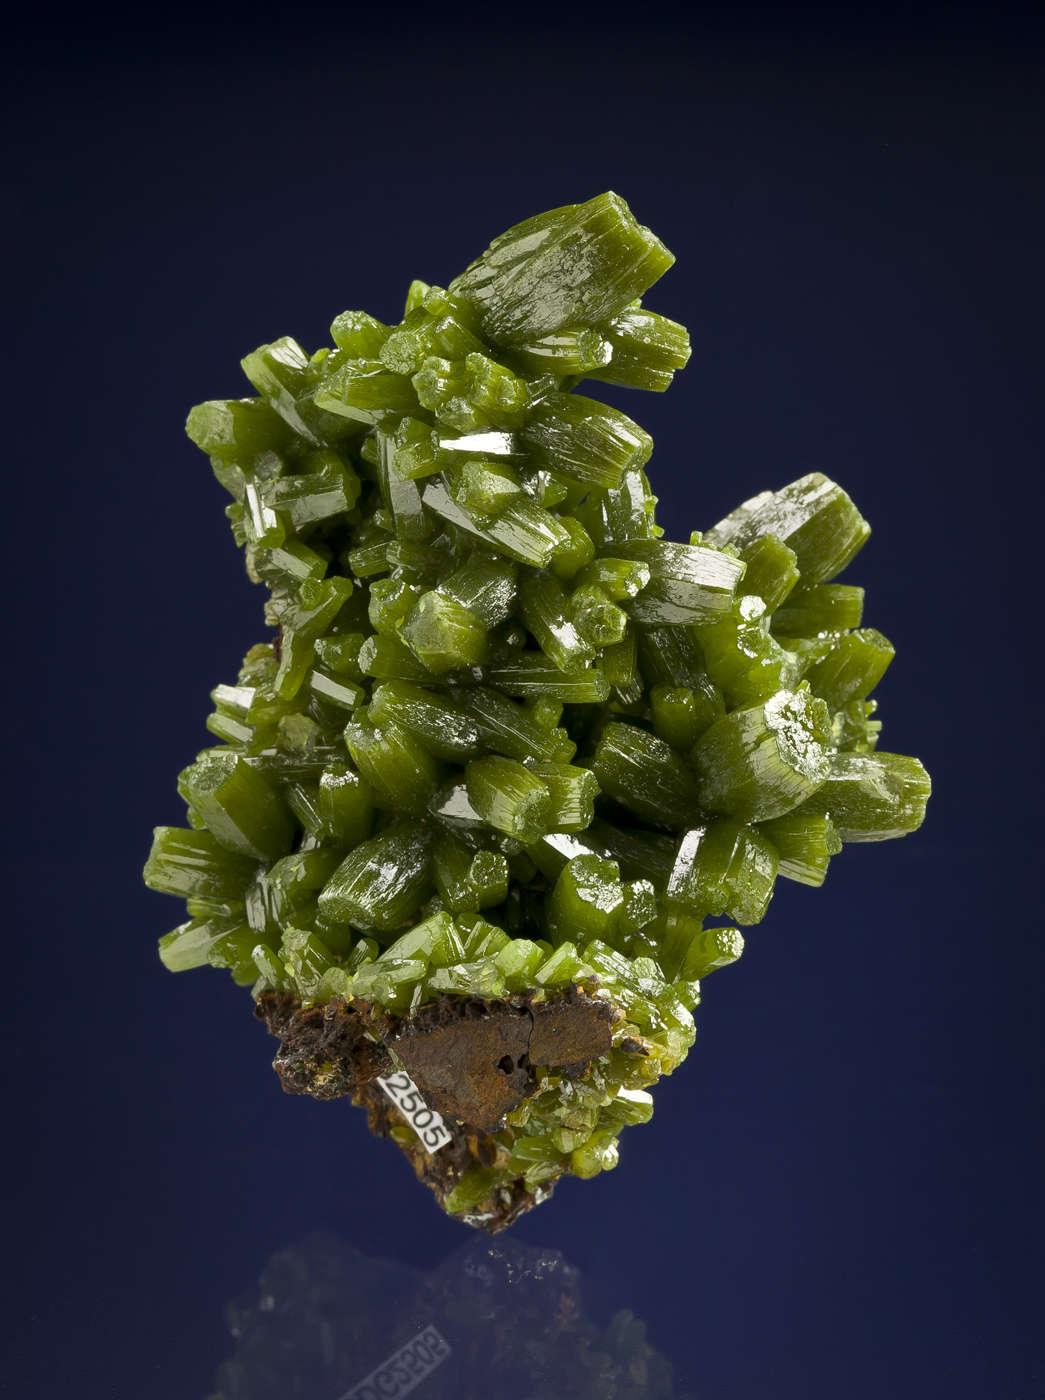 Pyromorphite - TUC12-582 - Les Farges Mine - France Mineral Specimen